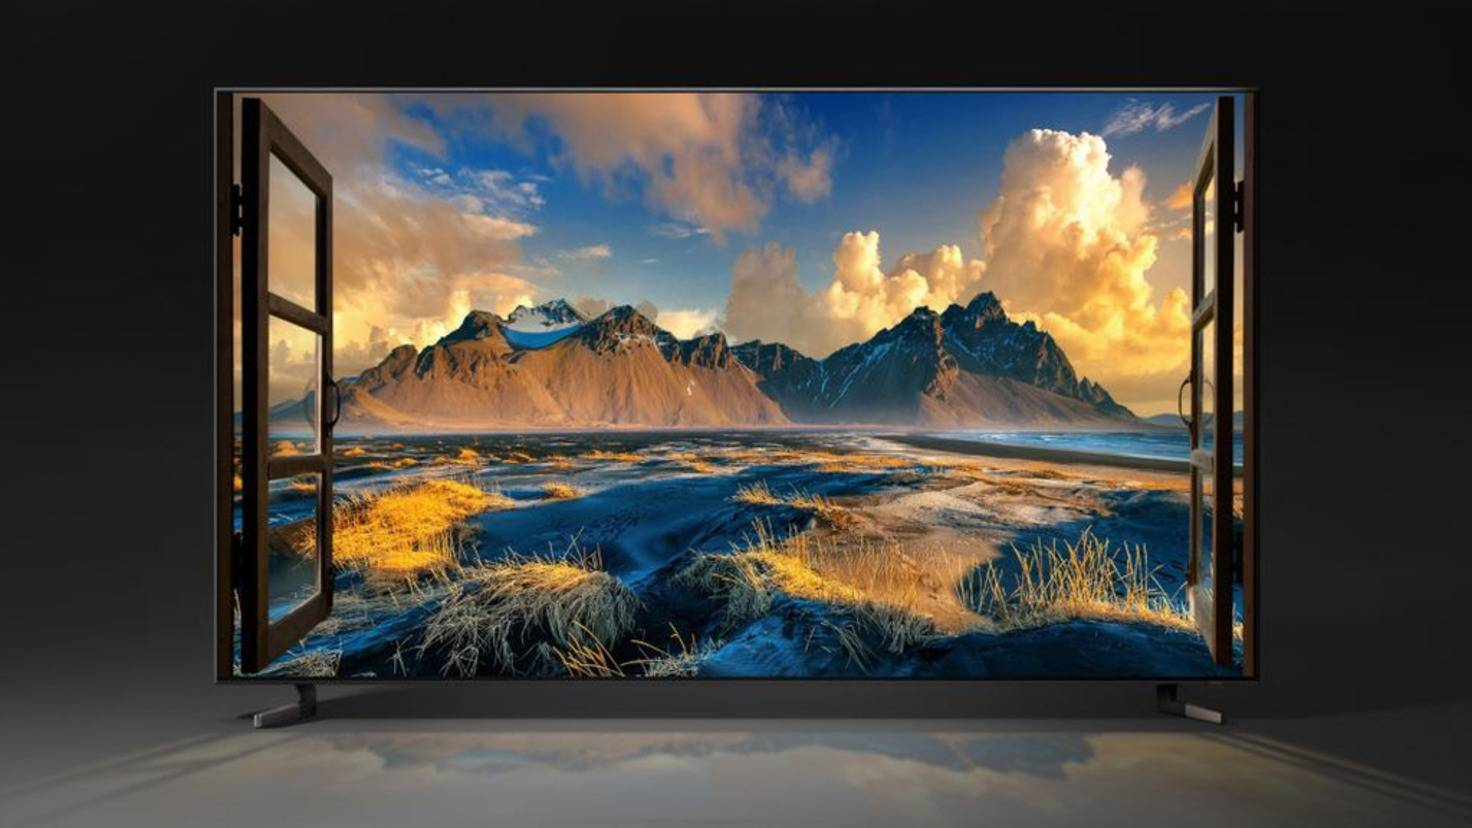 Samsung-8K-TV-QLED-Q900